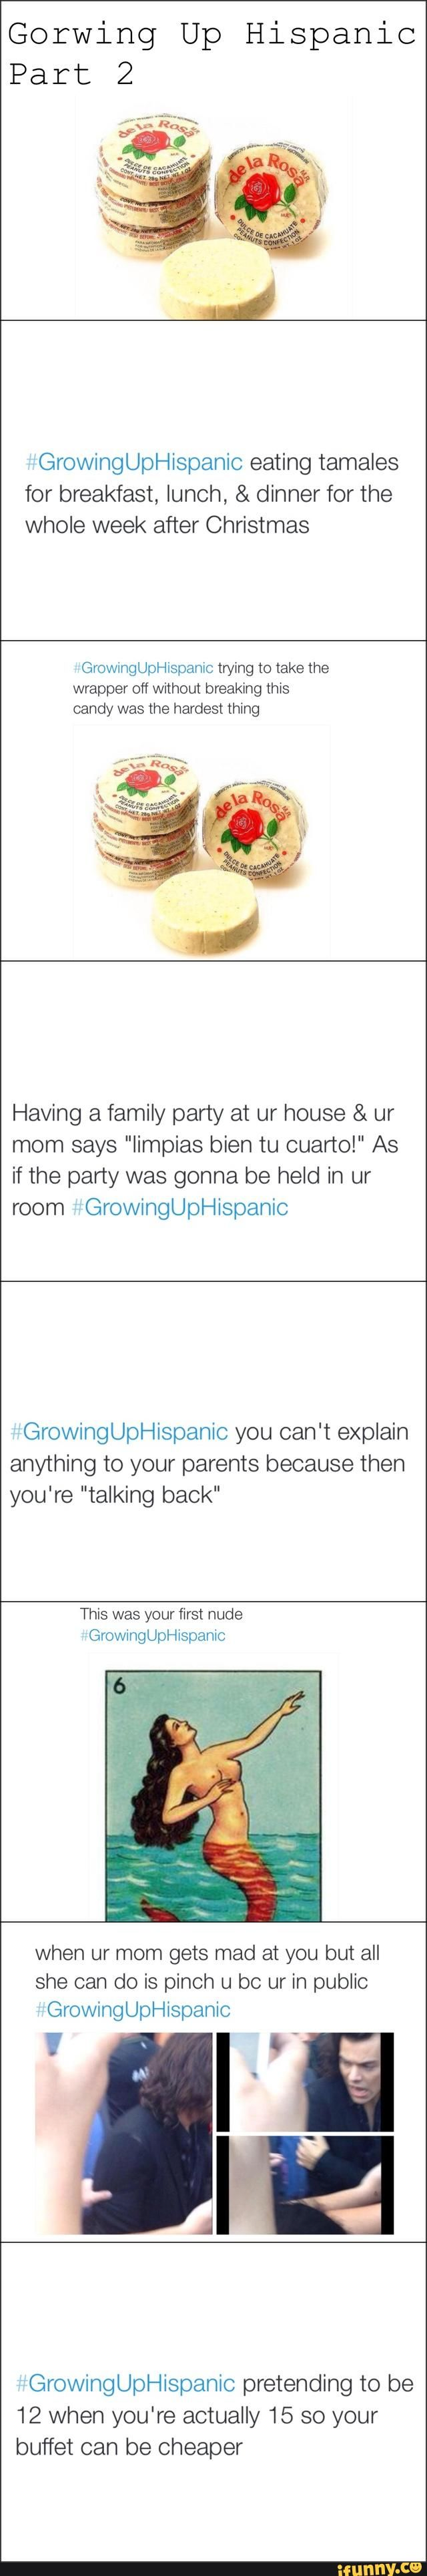 hispanic, growing, up, lol